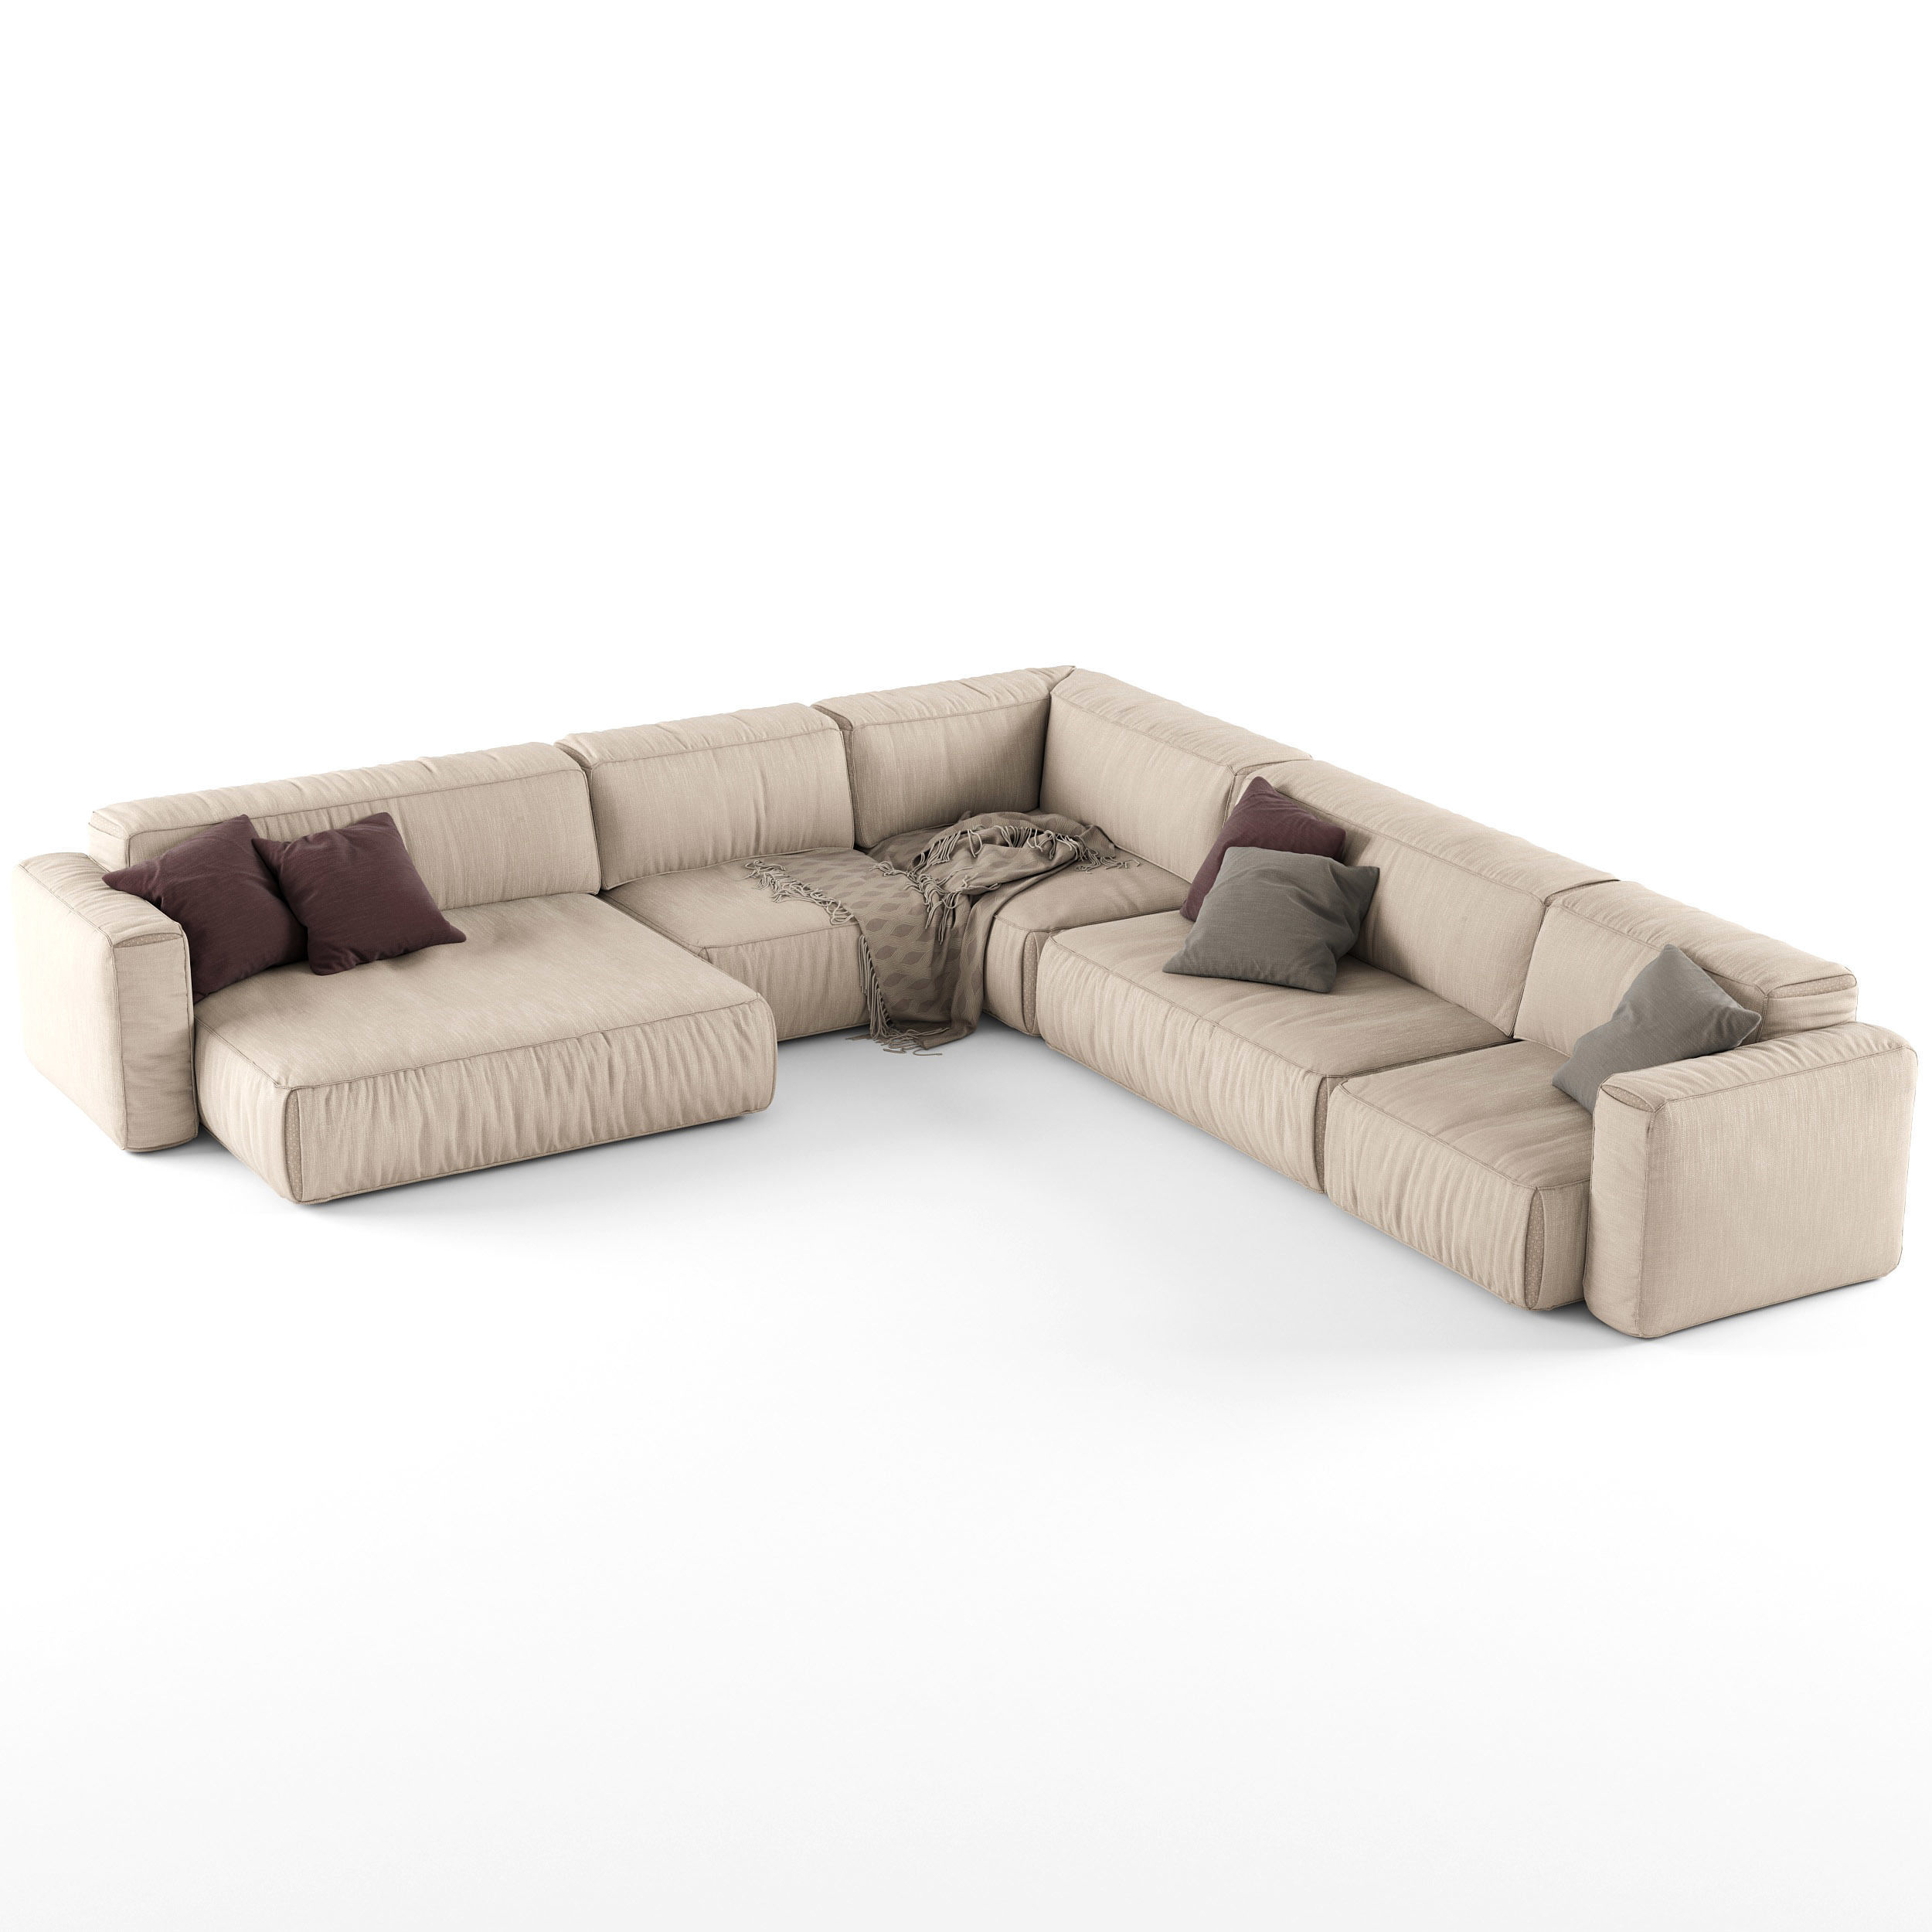 Koo International SOFT Sofa 4